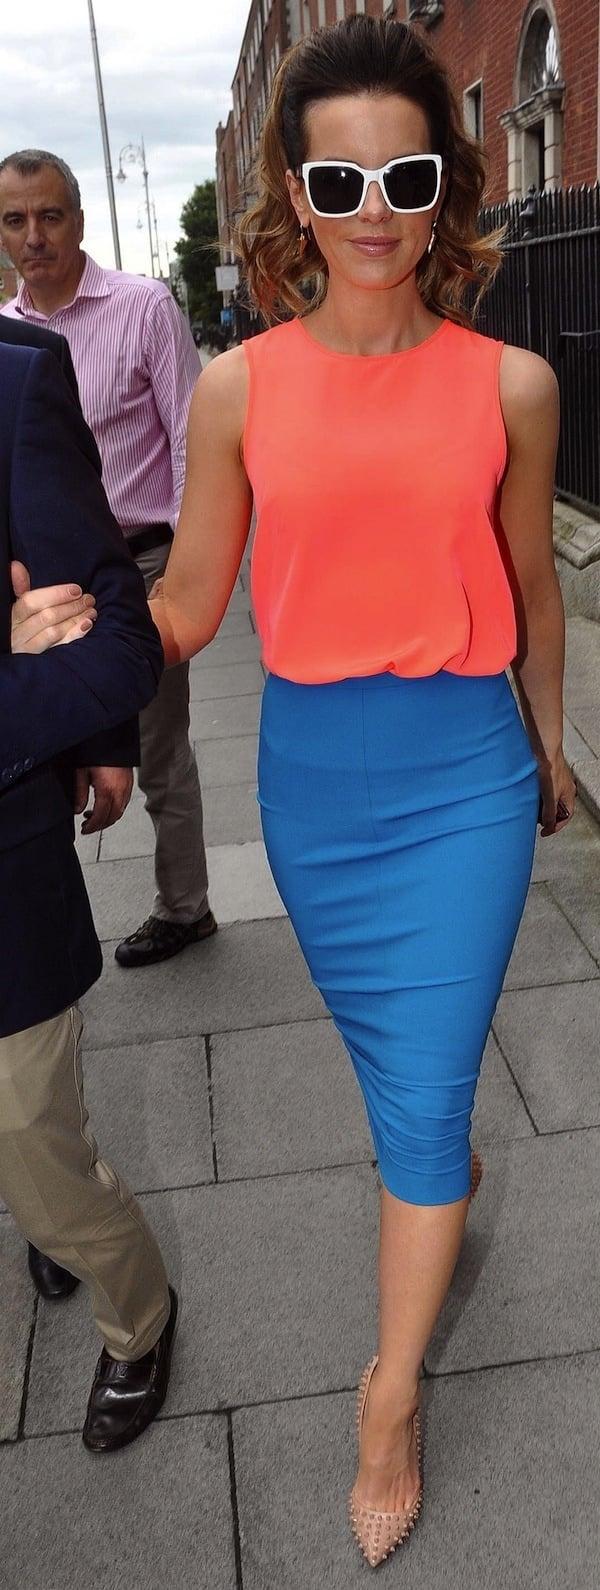 Kate Beckinsale shields her eyes behind a pair of white shades as she strolls through Dublin